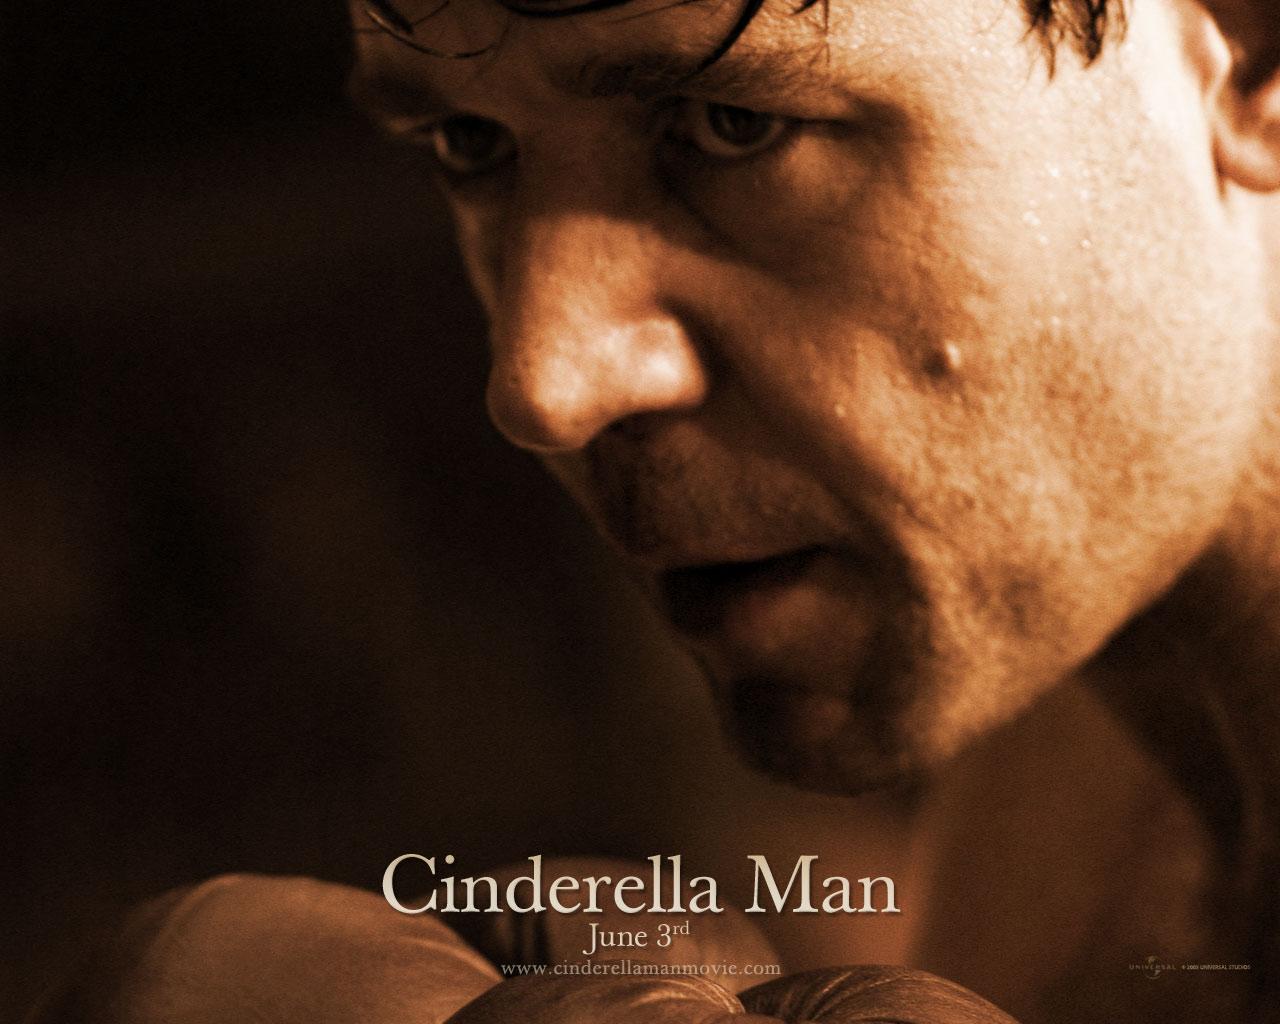 http://4.bp.blogspot.com/_YM2EMow08YI/TCSGcuPf0MI/AAAAAAAAACw/hzMNr-cRew4/s1600/Cinderella_Man.jpg